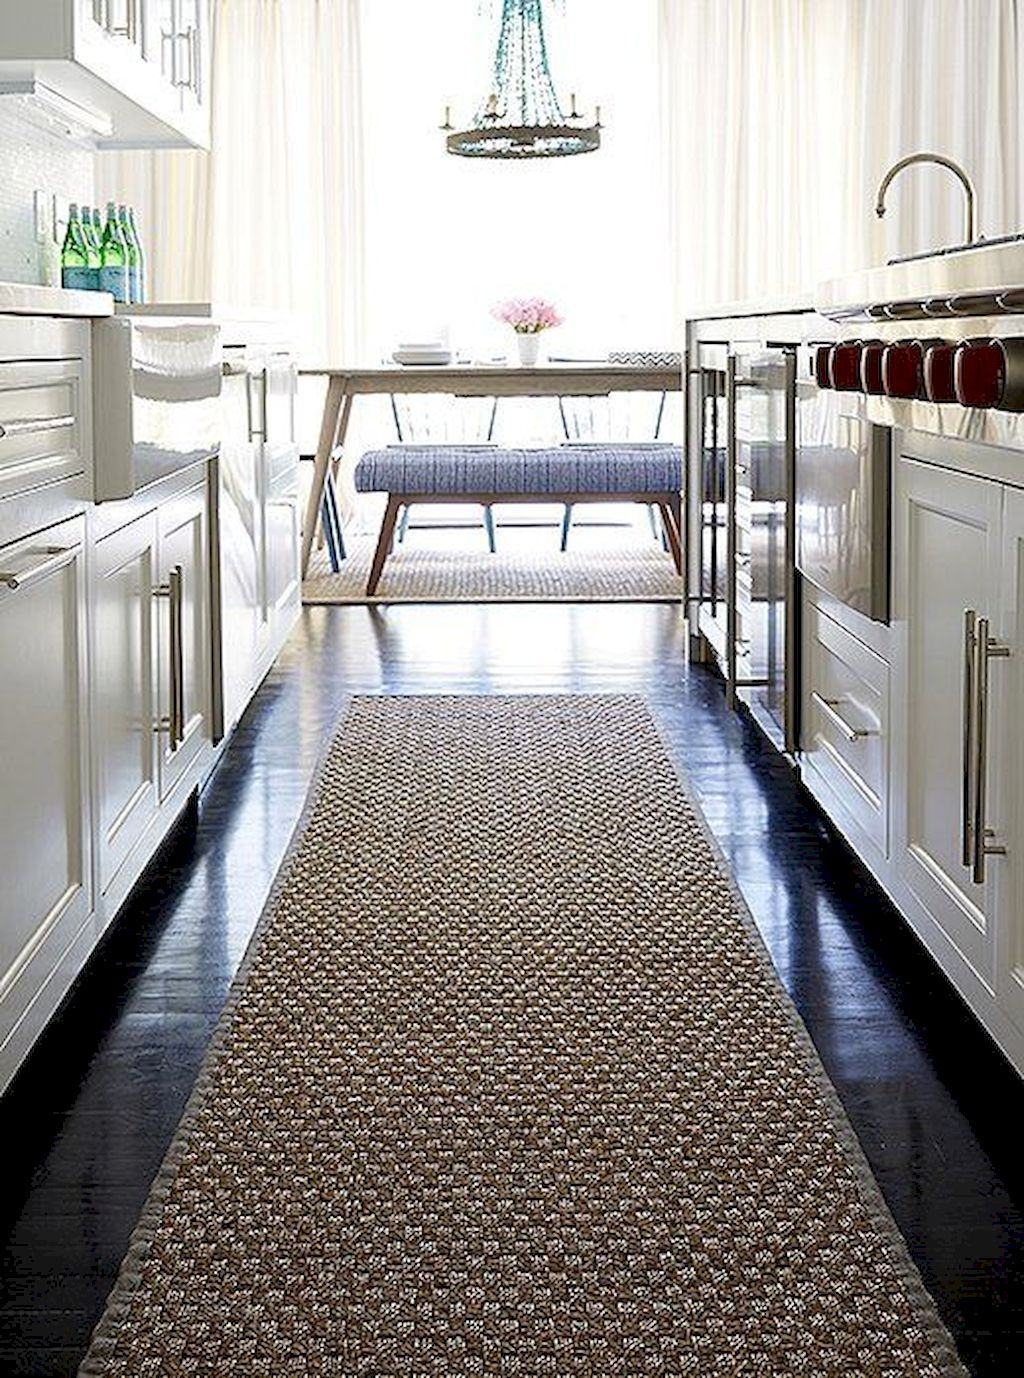 Kitchen Floor Mats Comfort And Ergonomic Type Of Mats In 2020 Rug Runner Kitchen Kitchen Area Rugs Kitchen Runner